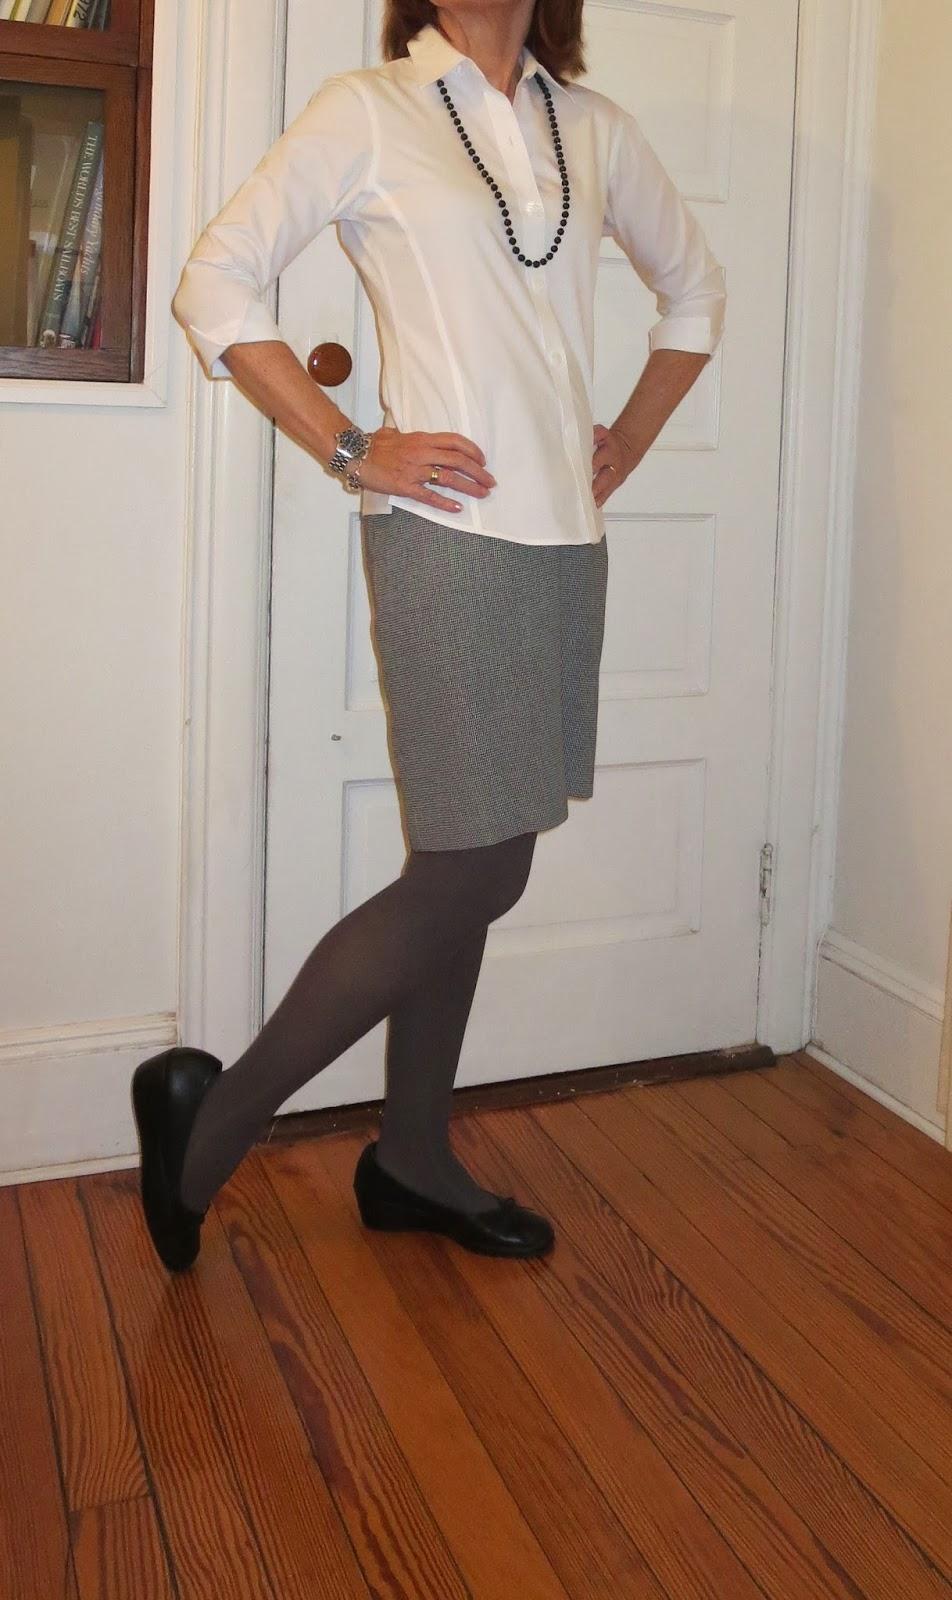 white blouse and skirt for women over 50